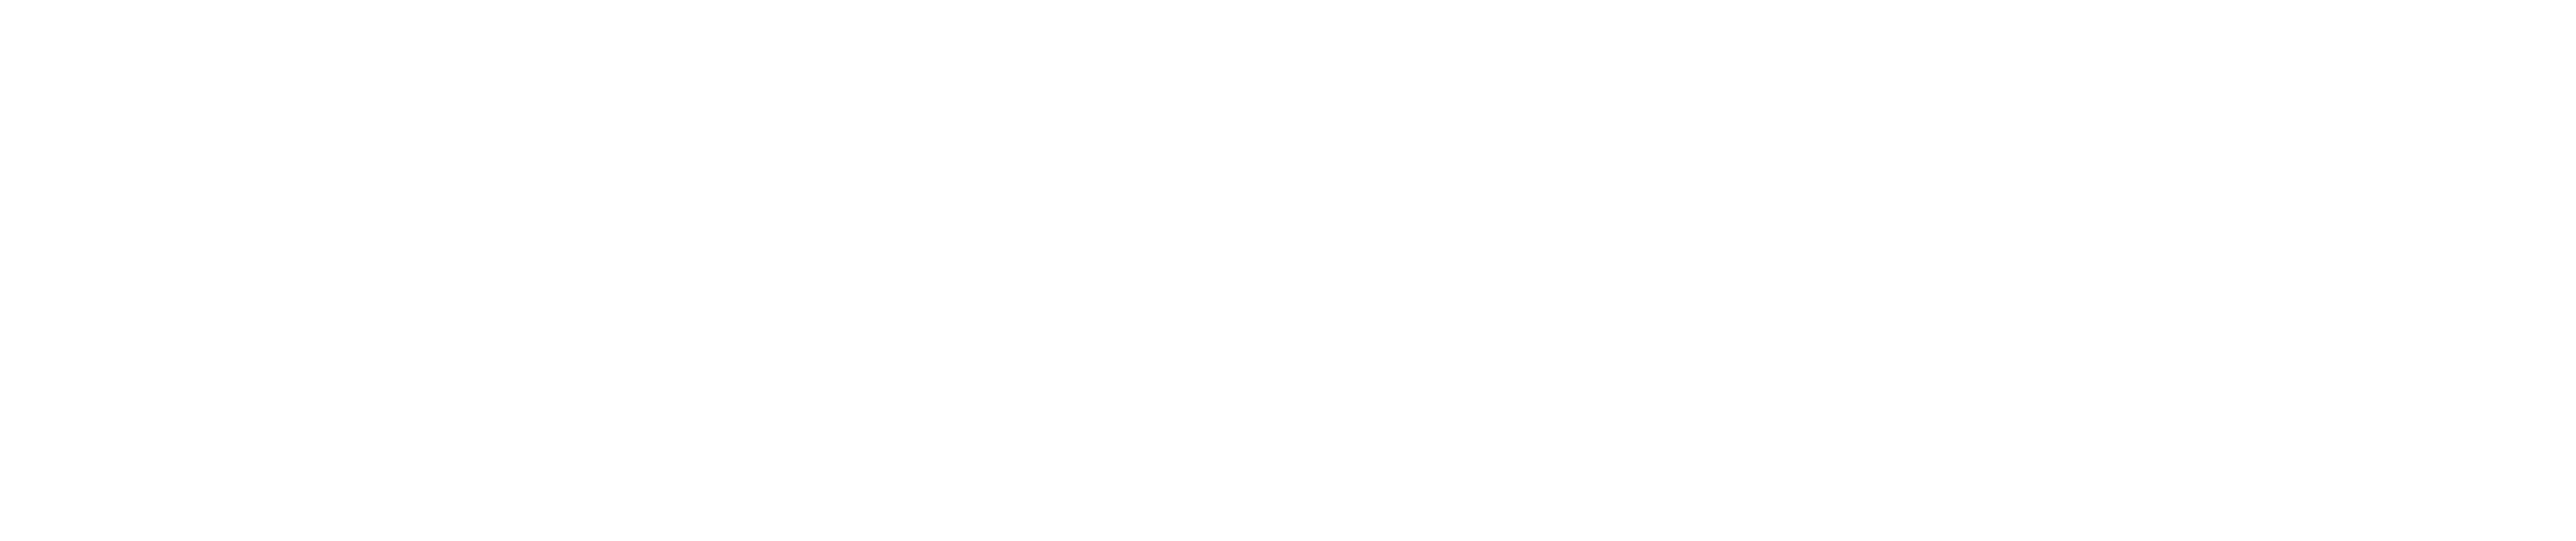 Saphira Productions